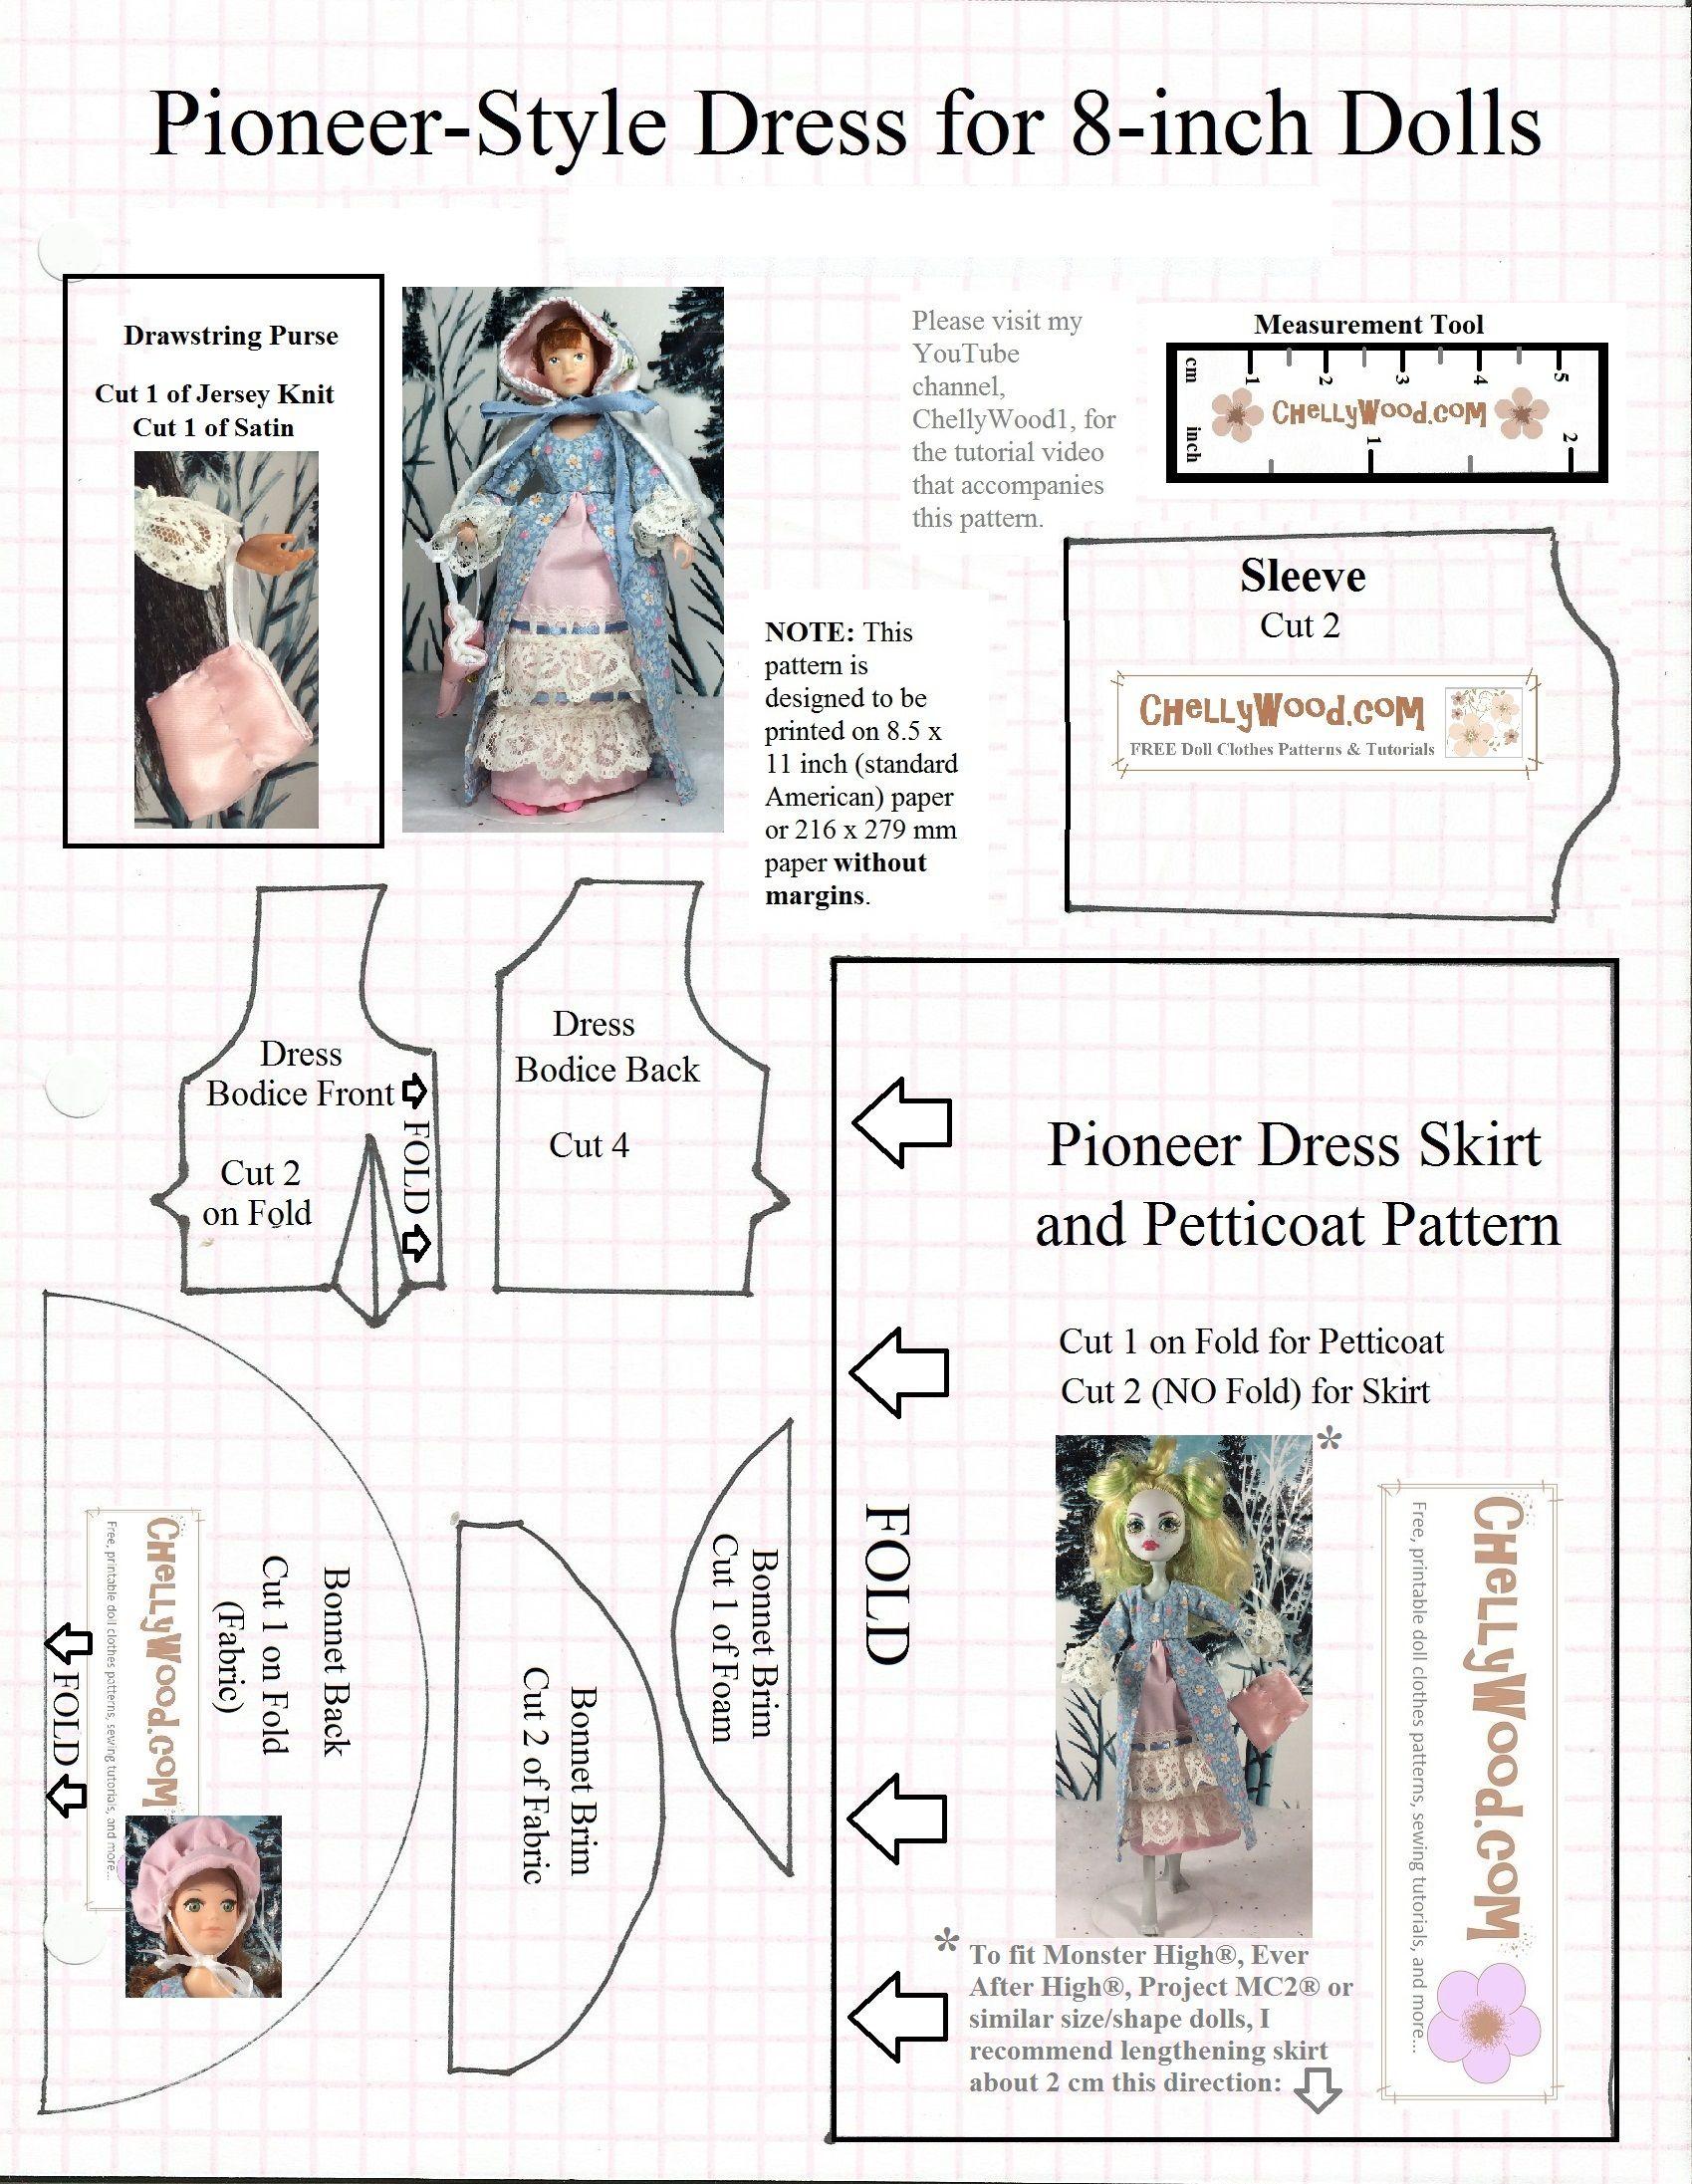 Pin by Debra Verwer on A Monster High Patterns | Monster ...